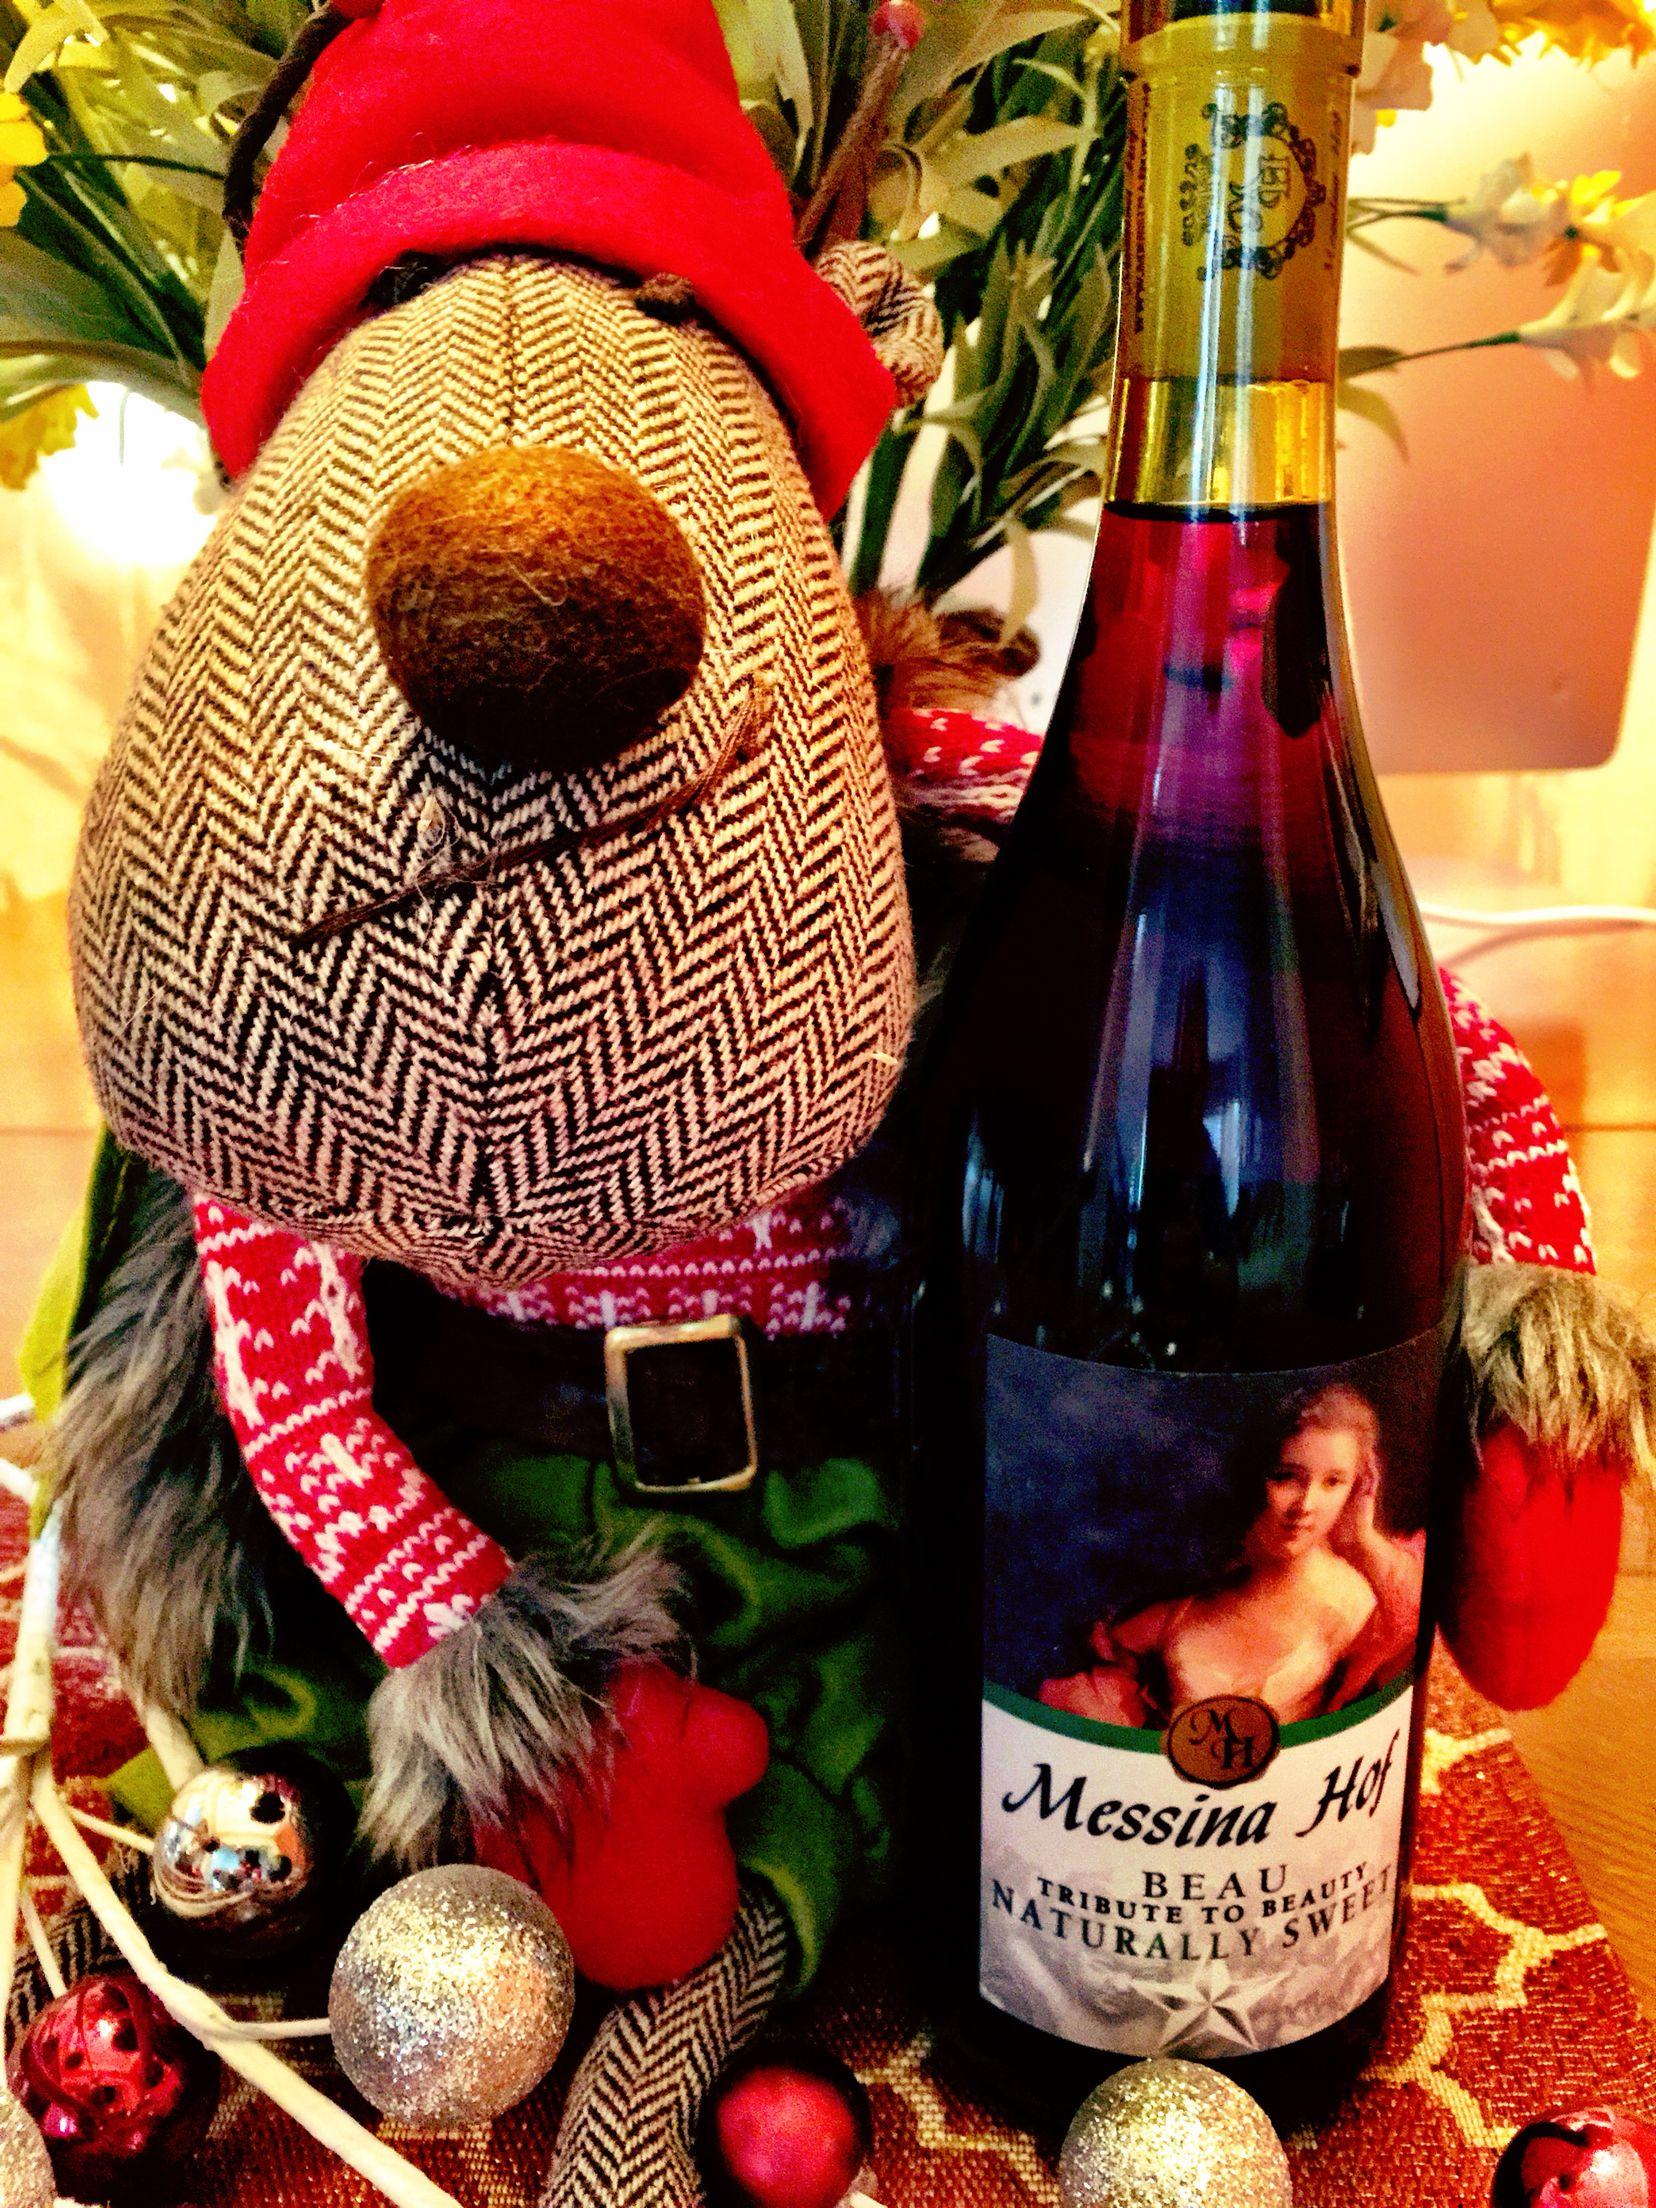 Messina Hof Beau A Tribute To Beauty A Naturally Sweet Red Wine Messinahof Texaswines Sweet Red Wines Wines Naturally Sweet